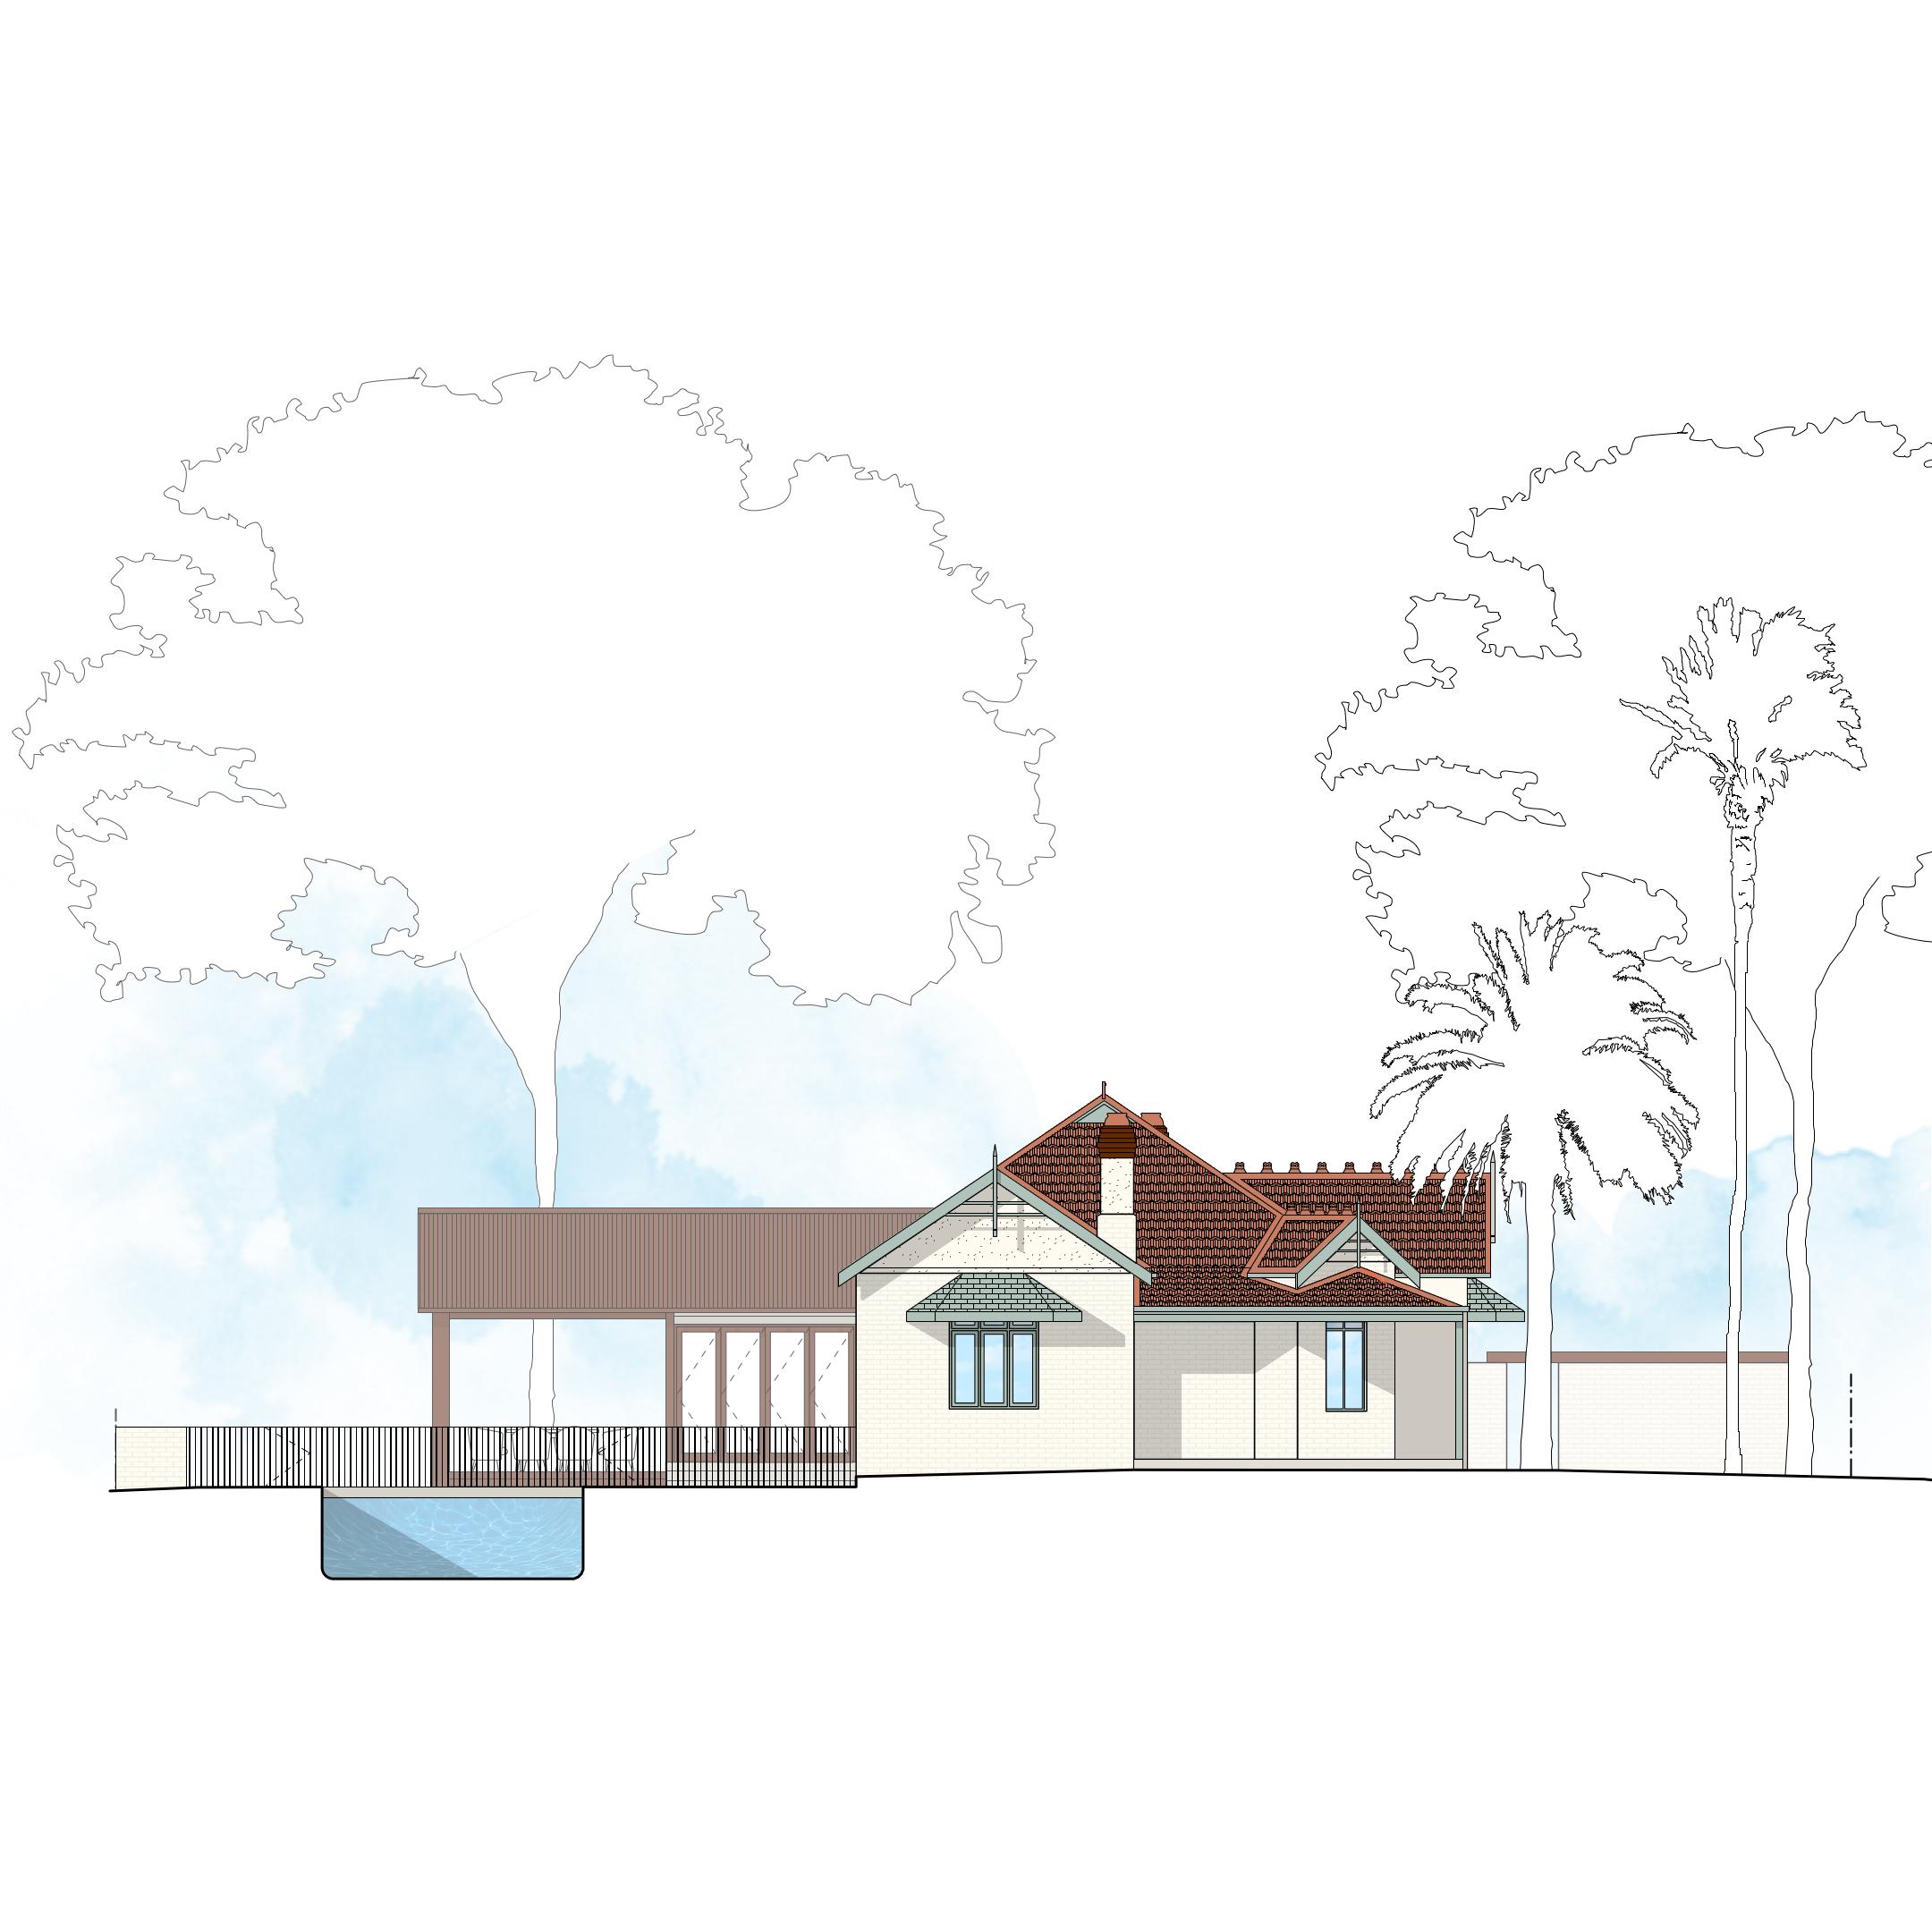 James Allen Architect Beecroft Beecroft House 4.jpg